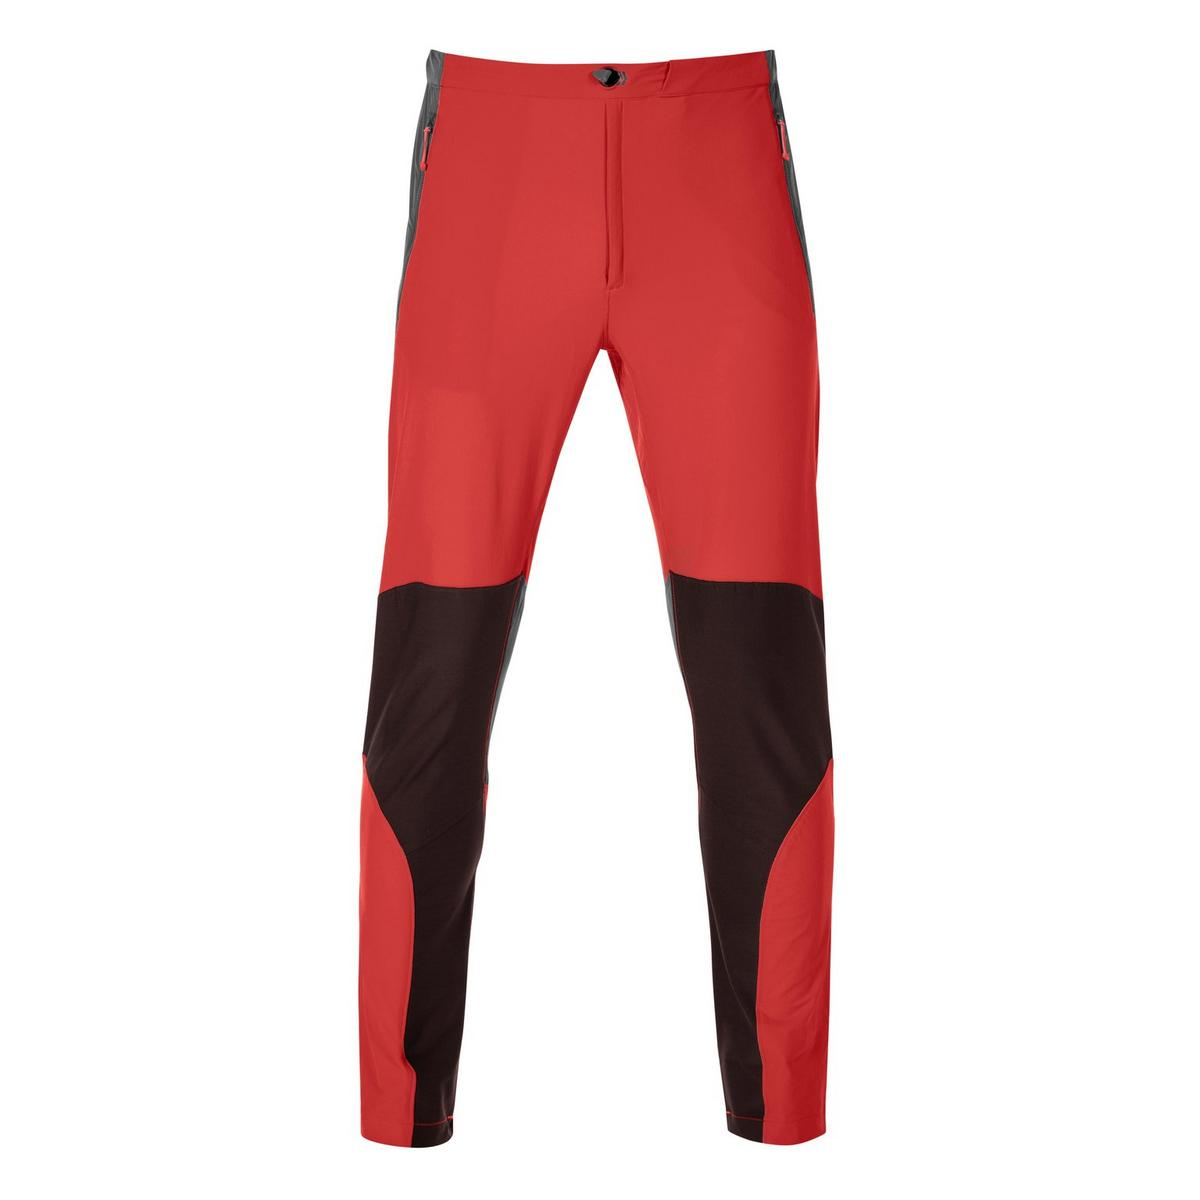 Rab Men's Torque Pant- Ascent Red